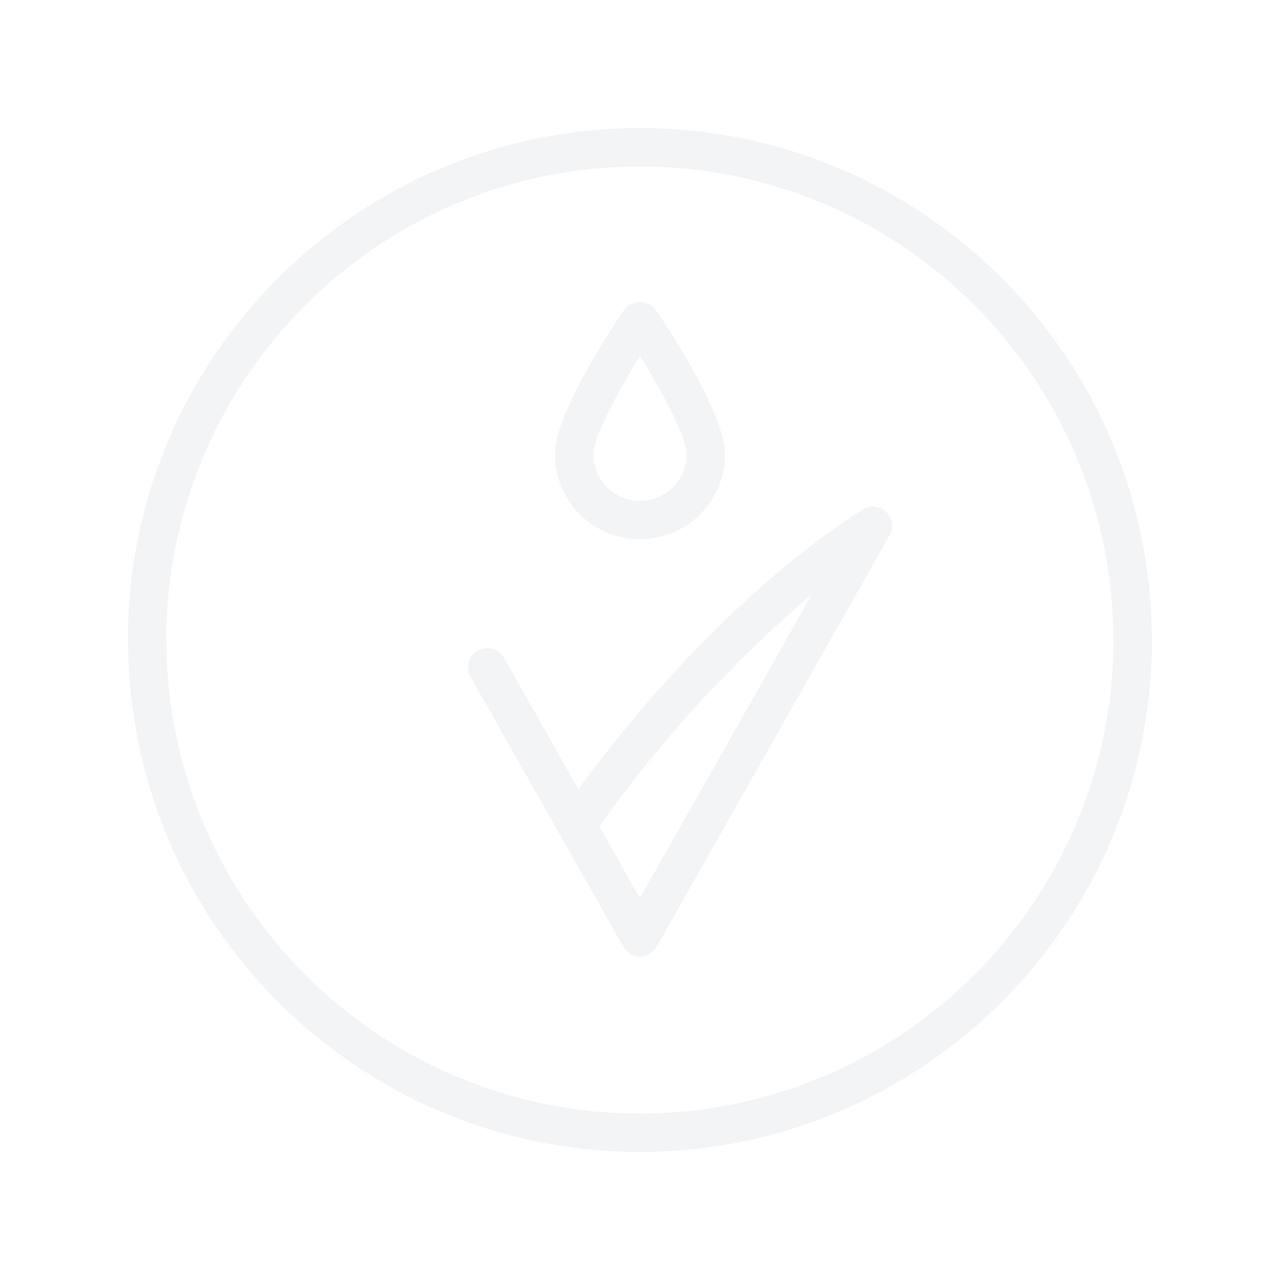 IDUN Minerals Mineral Concealer Idegran 3g